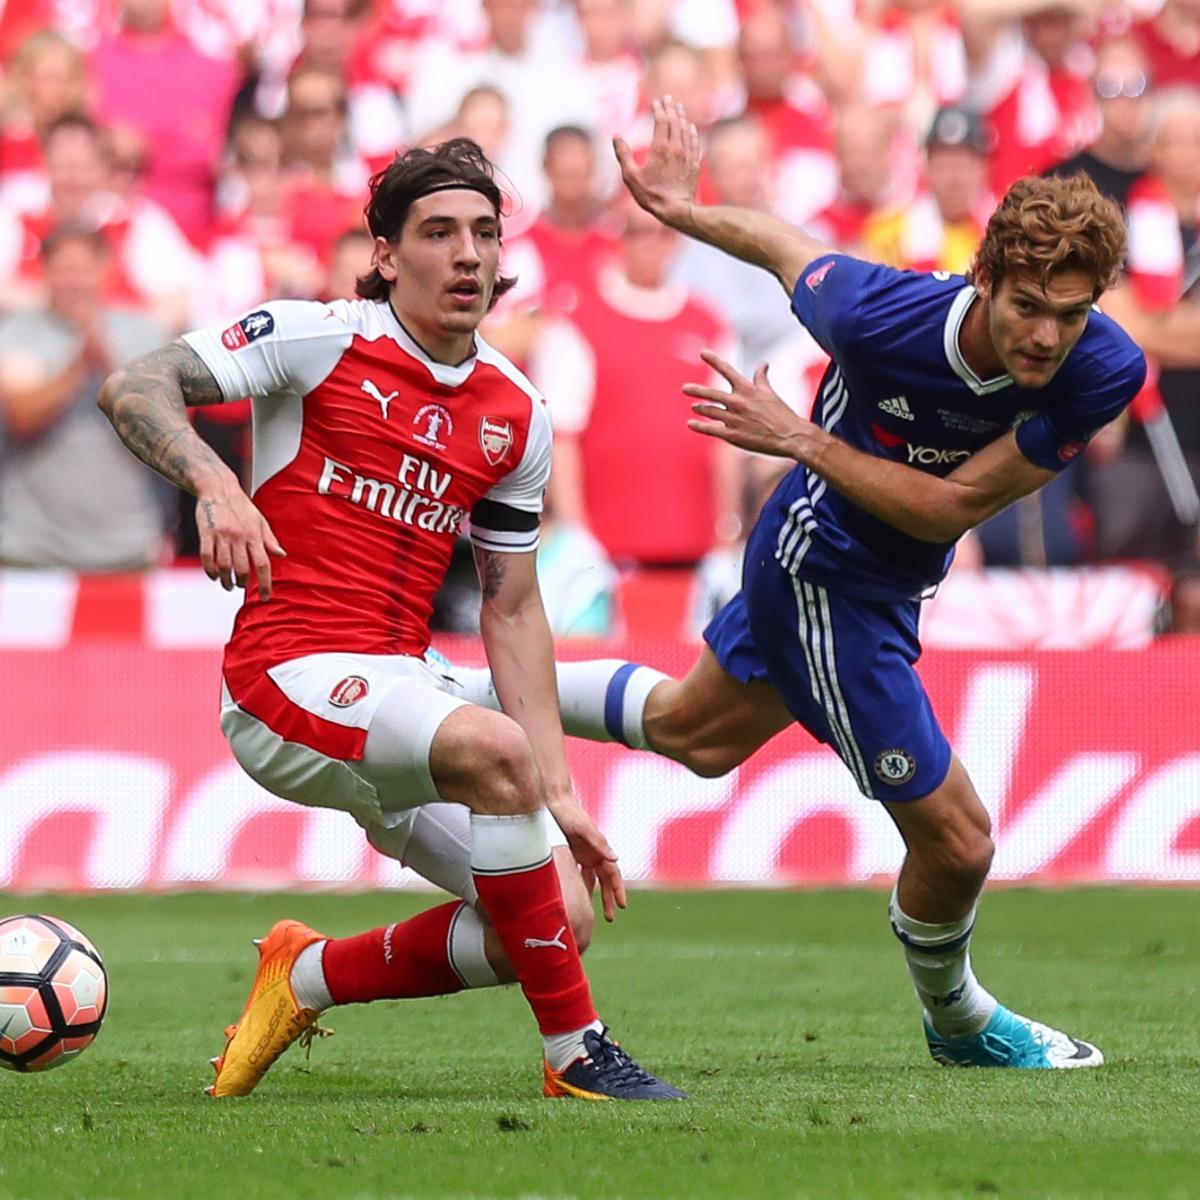 Arsenal vs. Chelsea: Live Stream, TV Info for 2017 Pre-Season Friendly ...